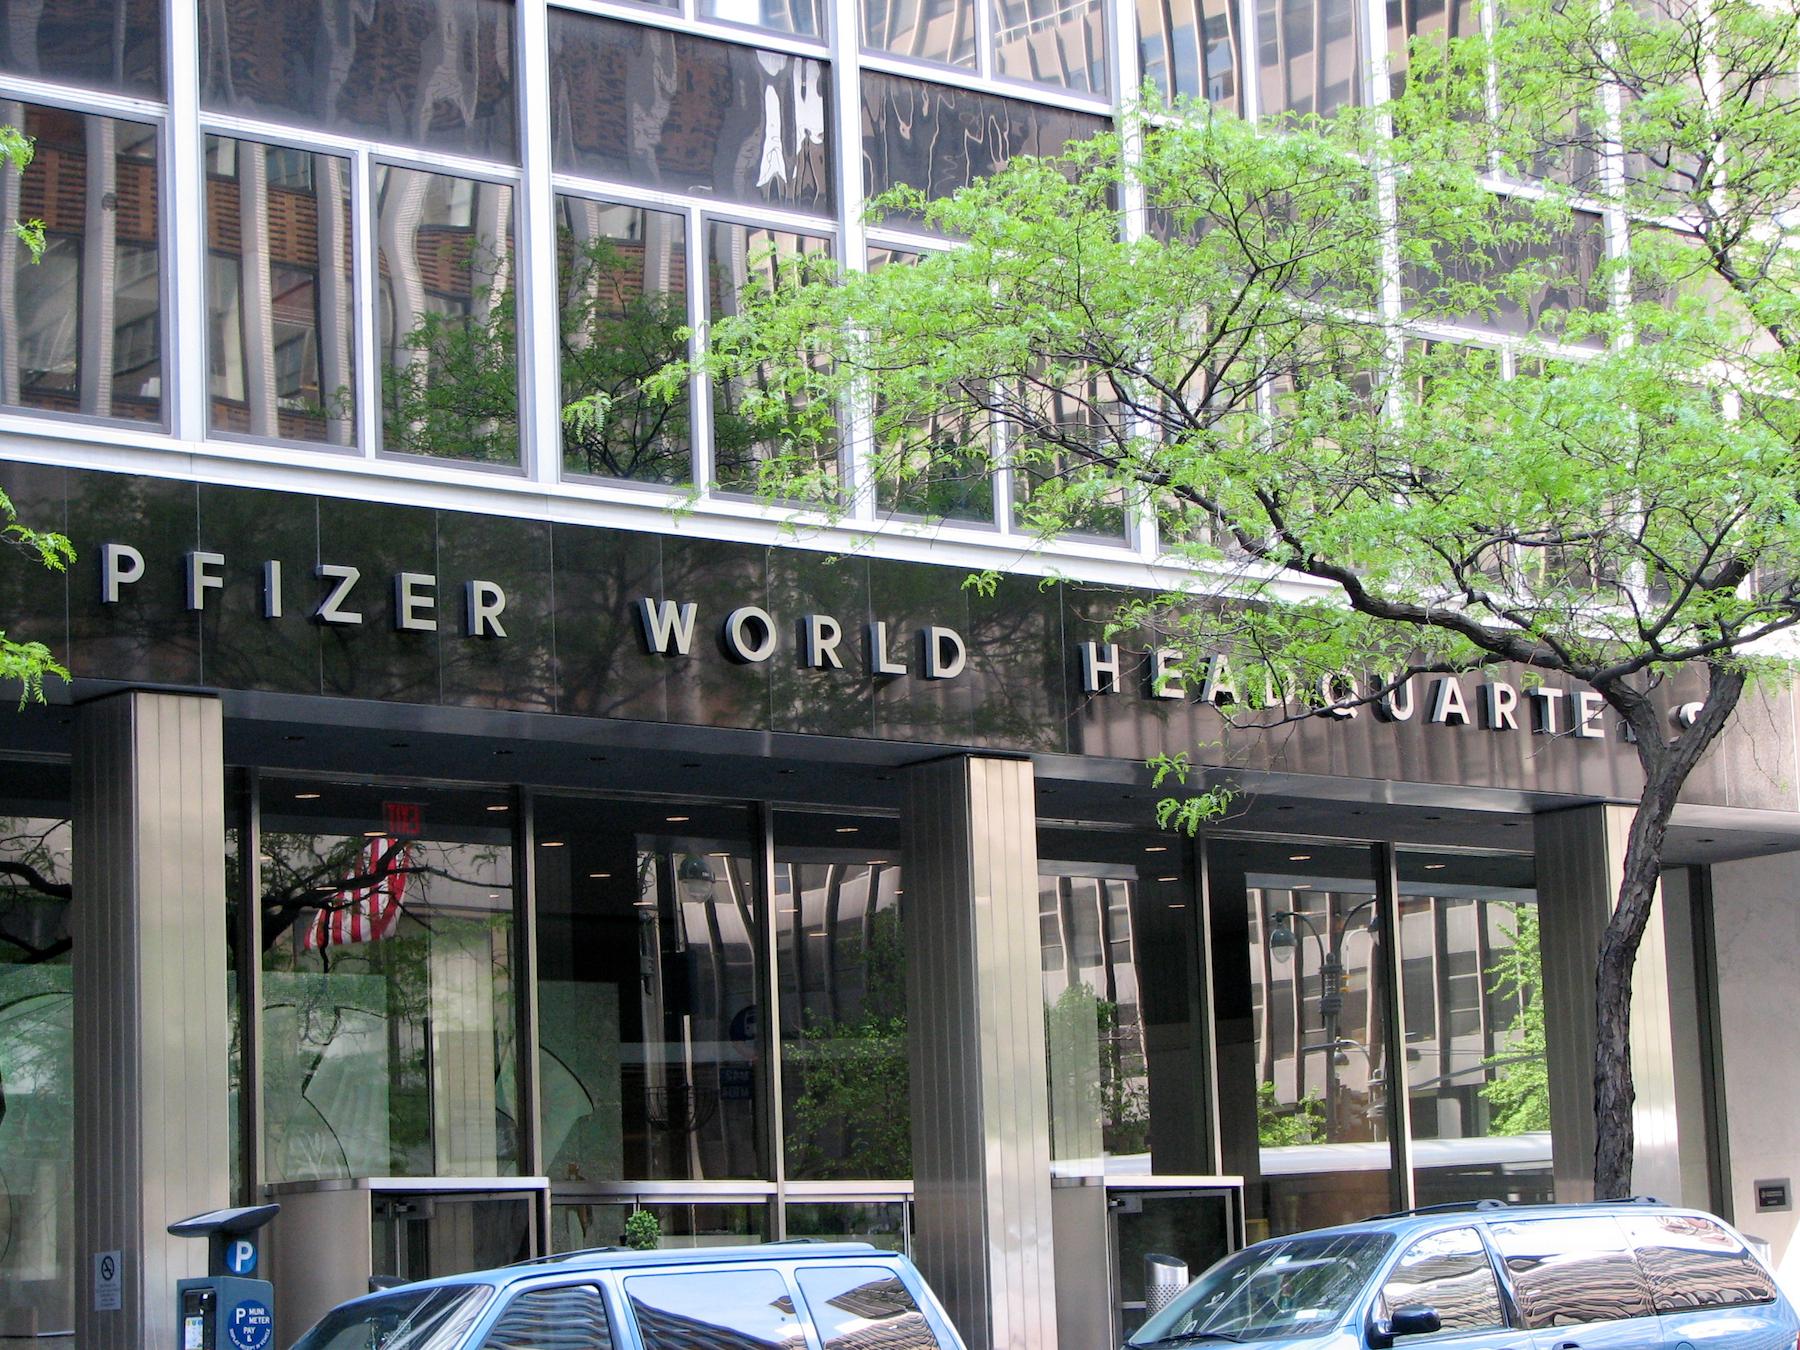 New York City Pfizer World Headquarters 02